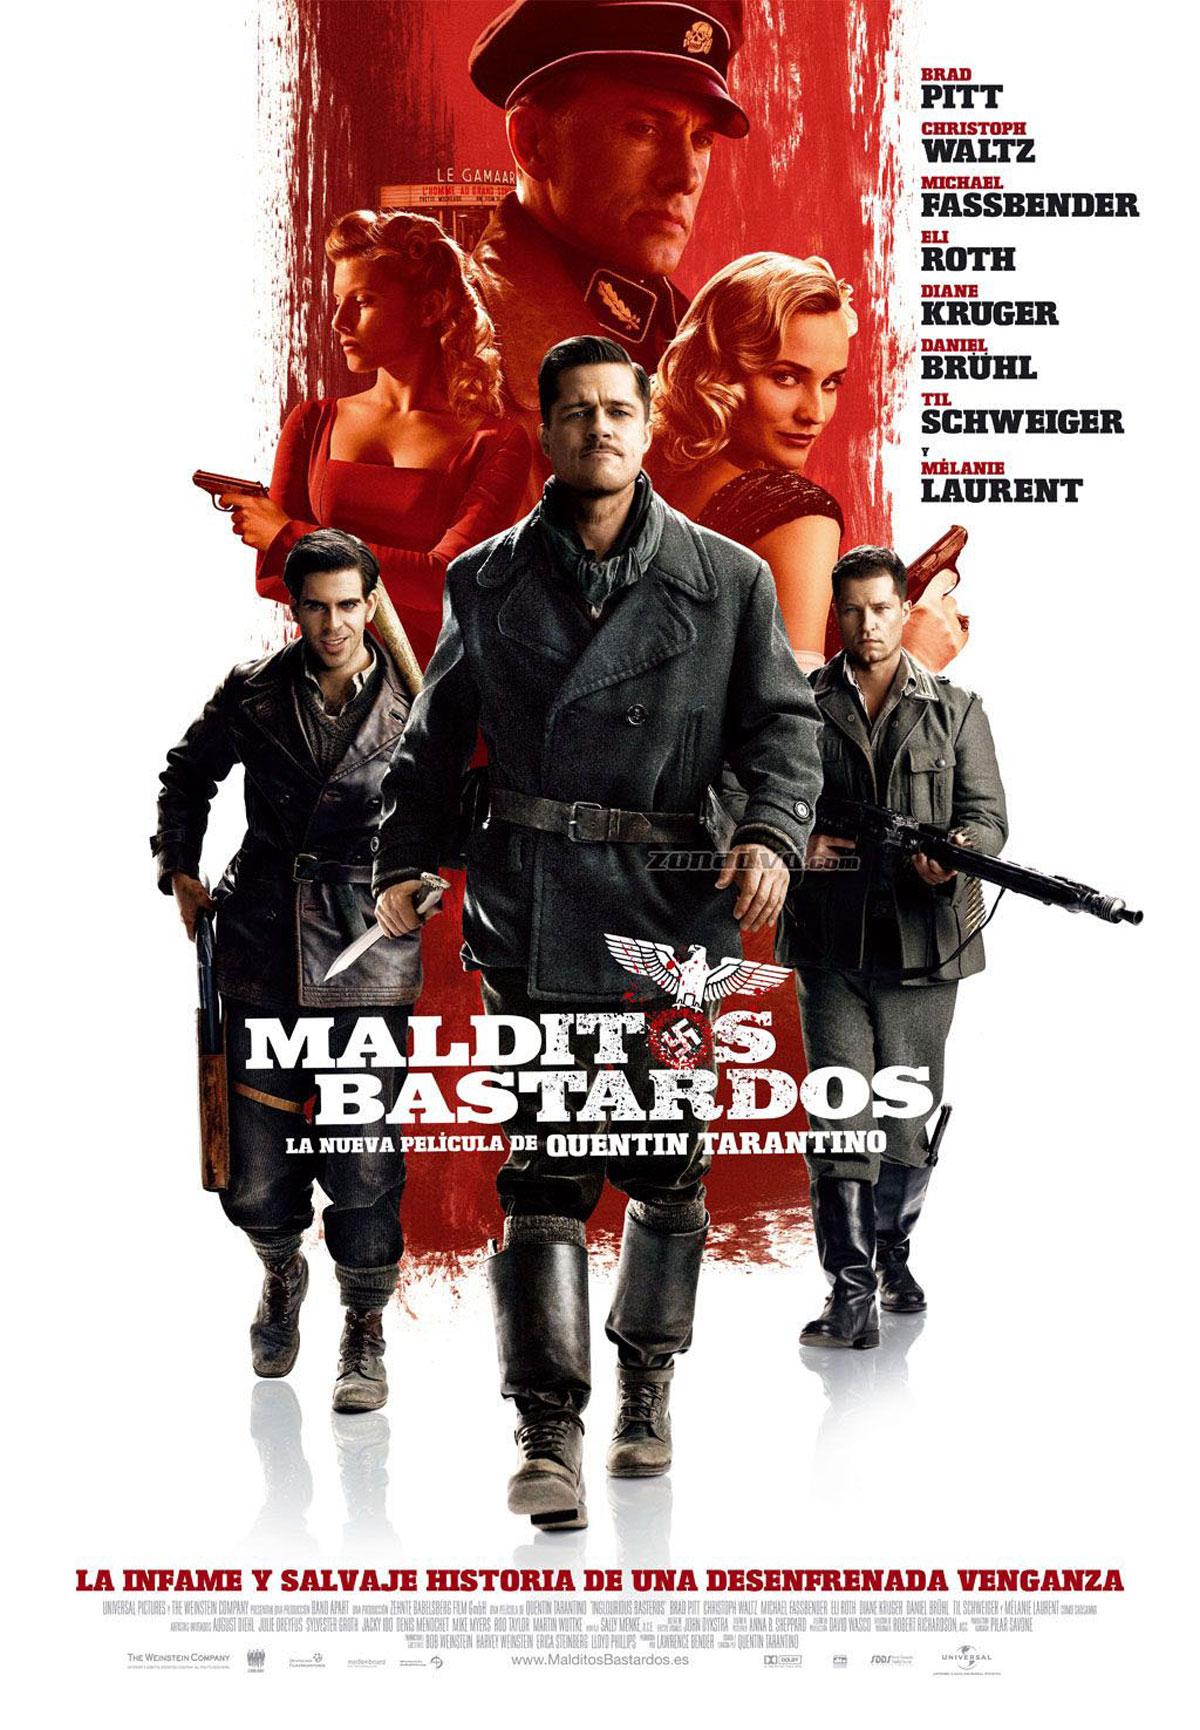 Cartel de la película Malditos bastardos, de Quentin Tarantino